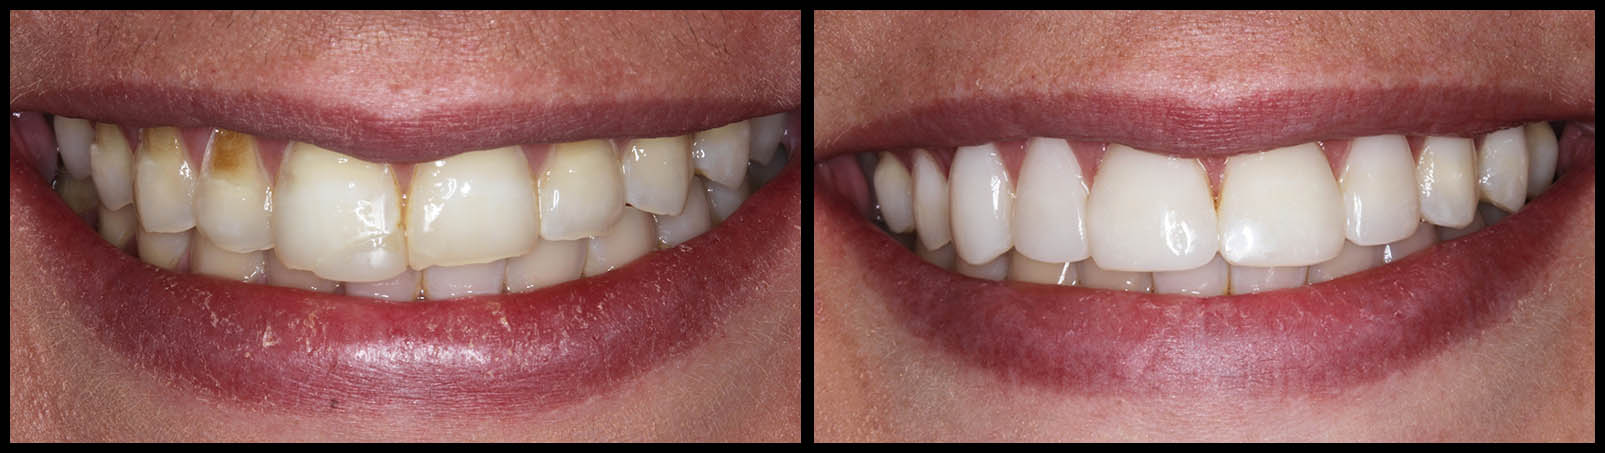 Dental Bonding - Before and After Bunker Hill Dentistry